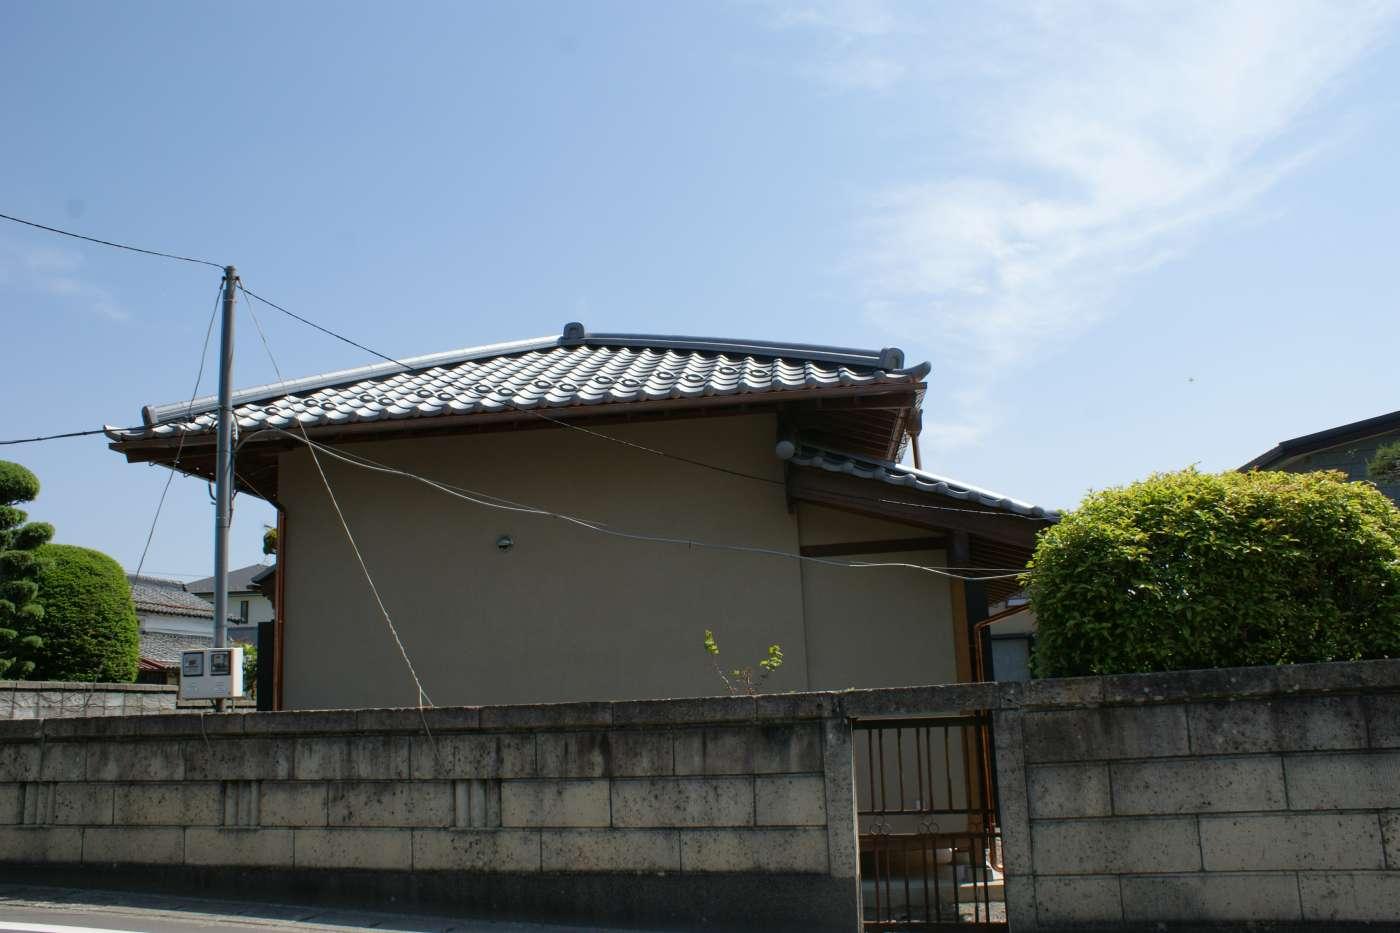 http://sumainomatsuki.com/folder1/8.JPG